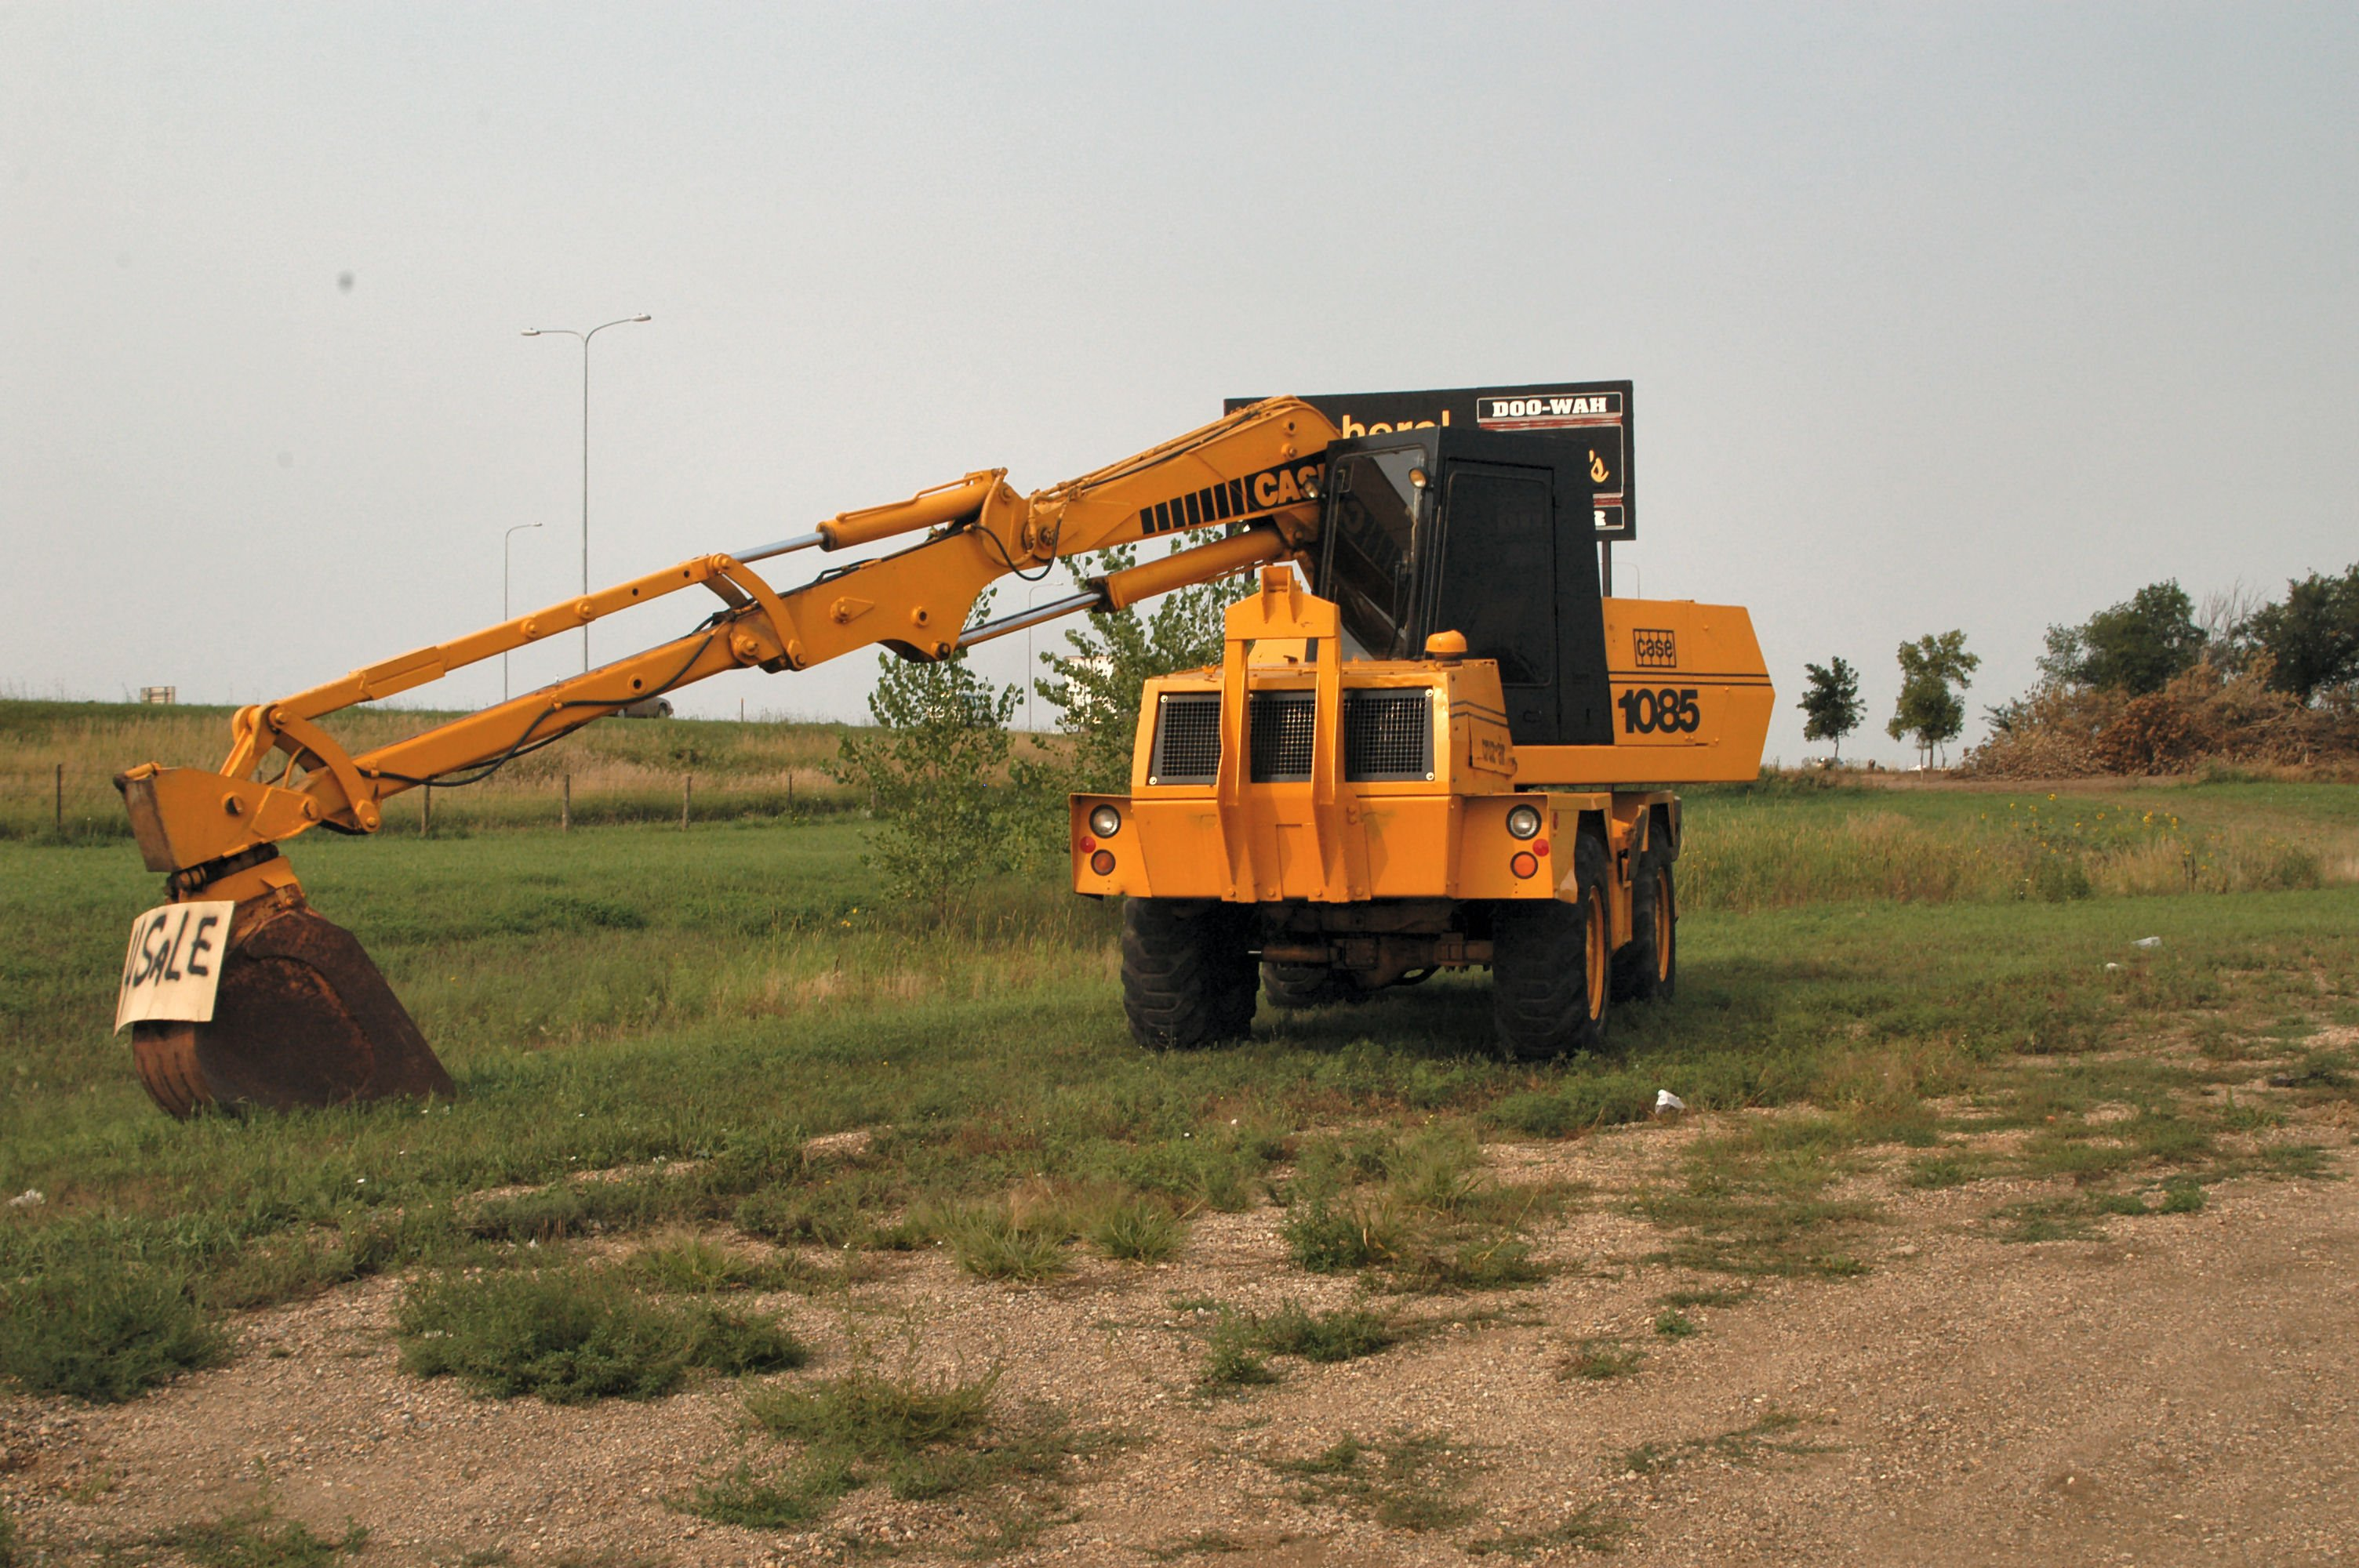 cruz air  escavatore gommato case drott Case_1085_cruz_air_01_of_57